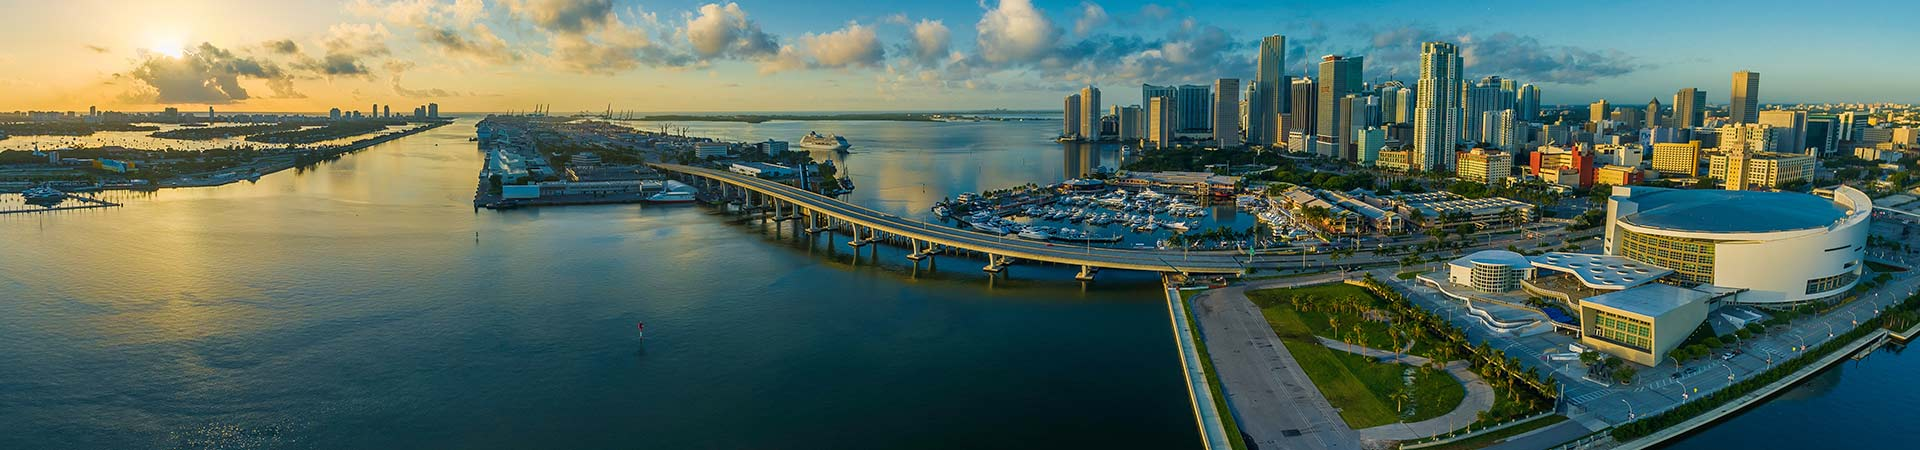 Miami Oceanfront View